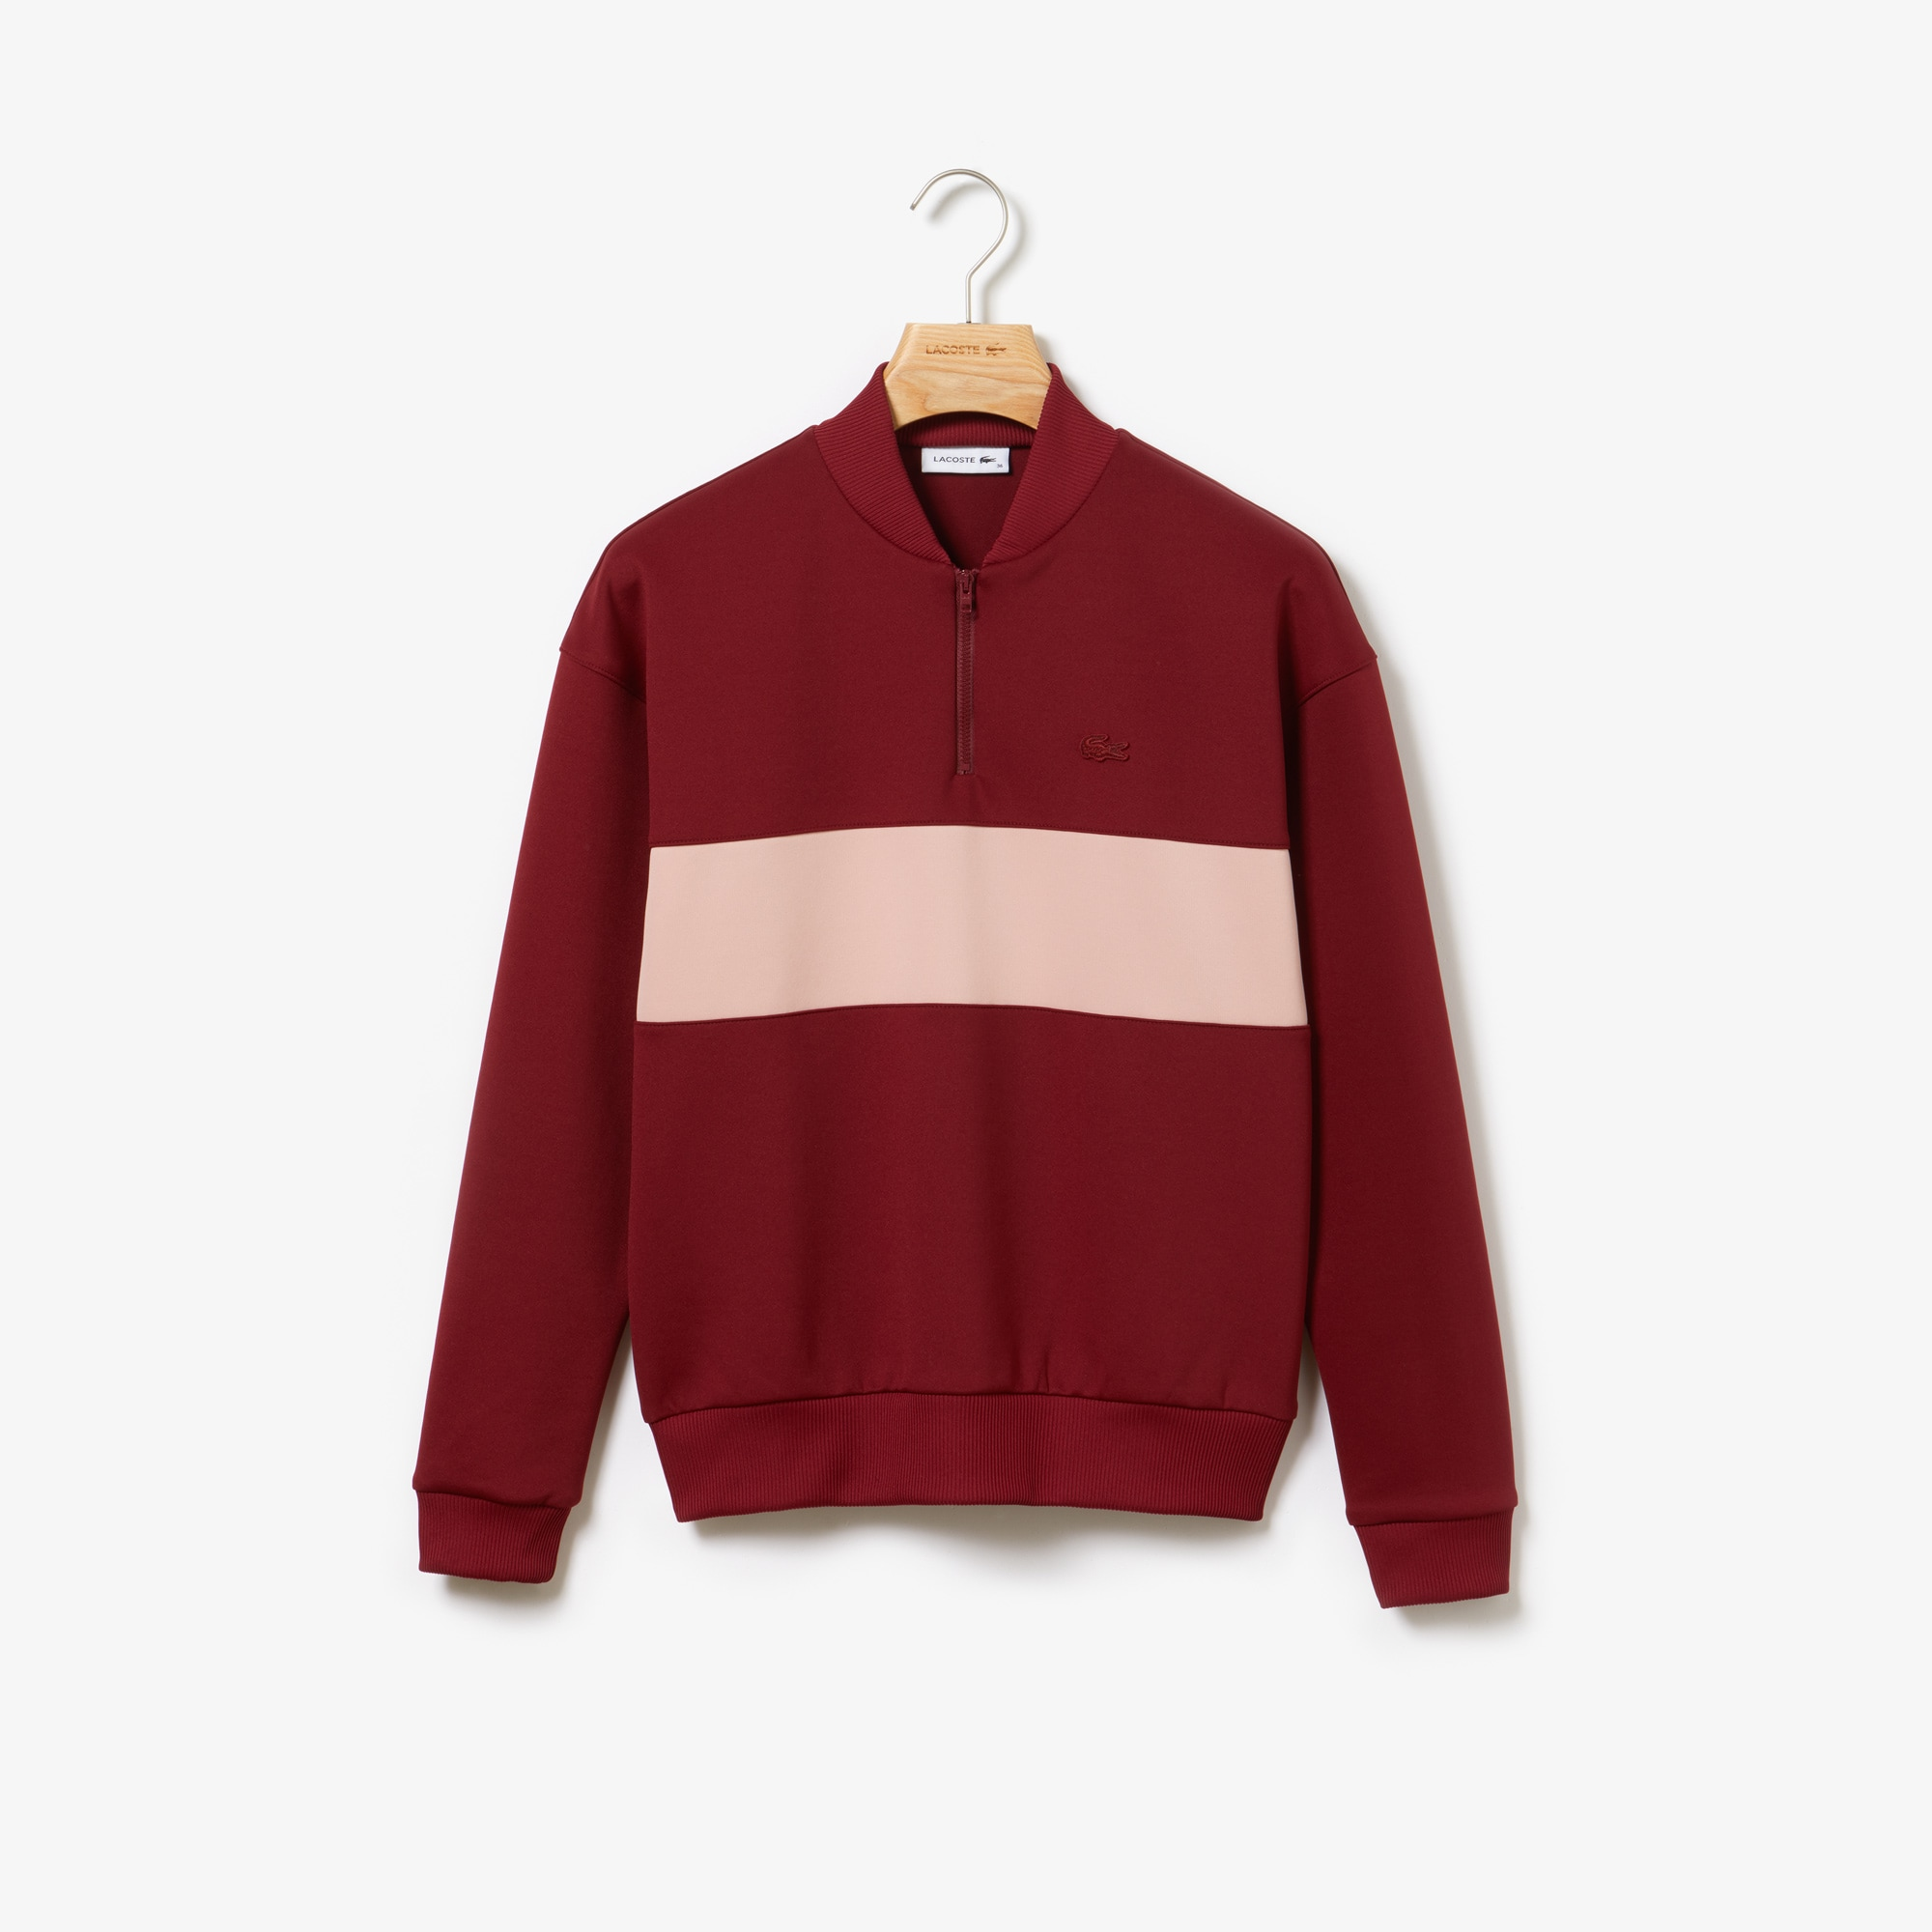 Women's Neoprene Sweatshirt